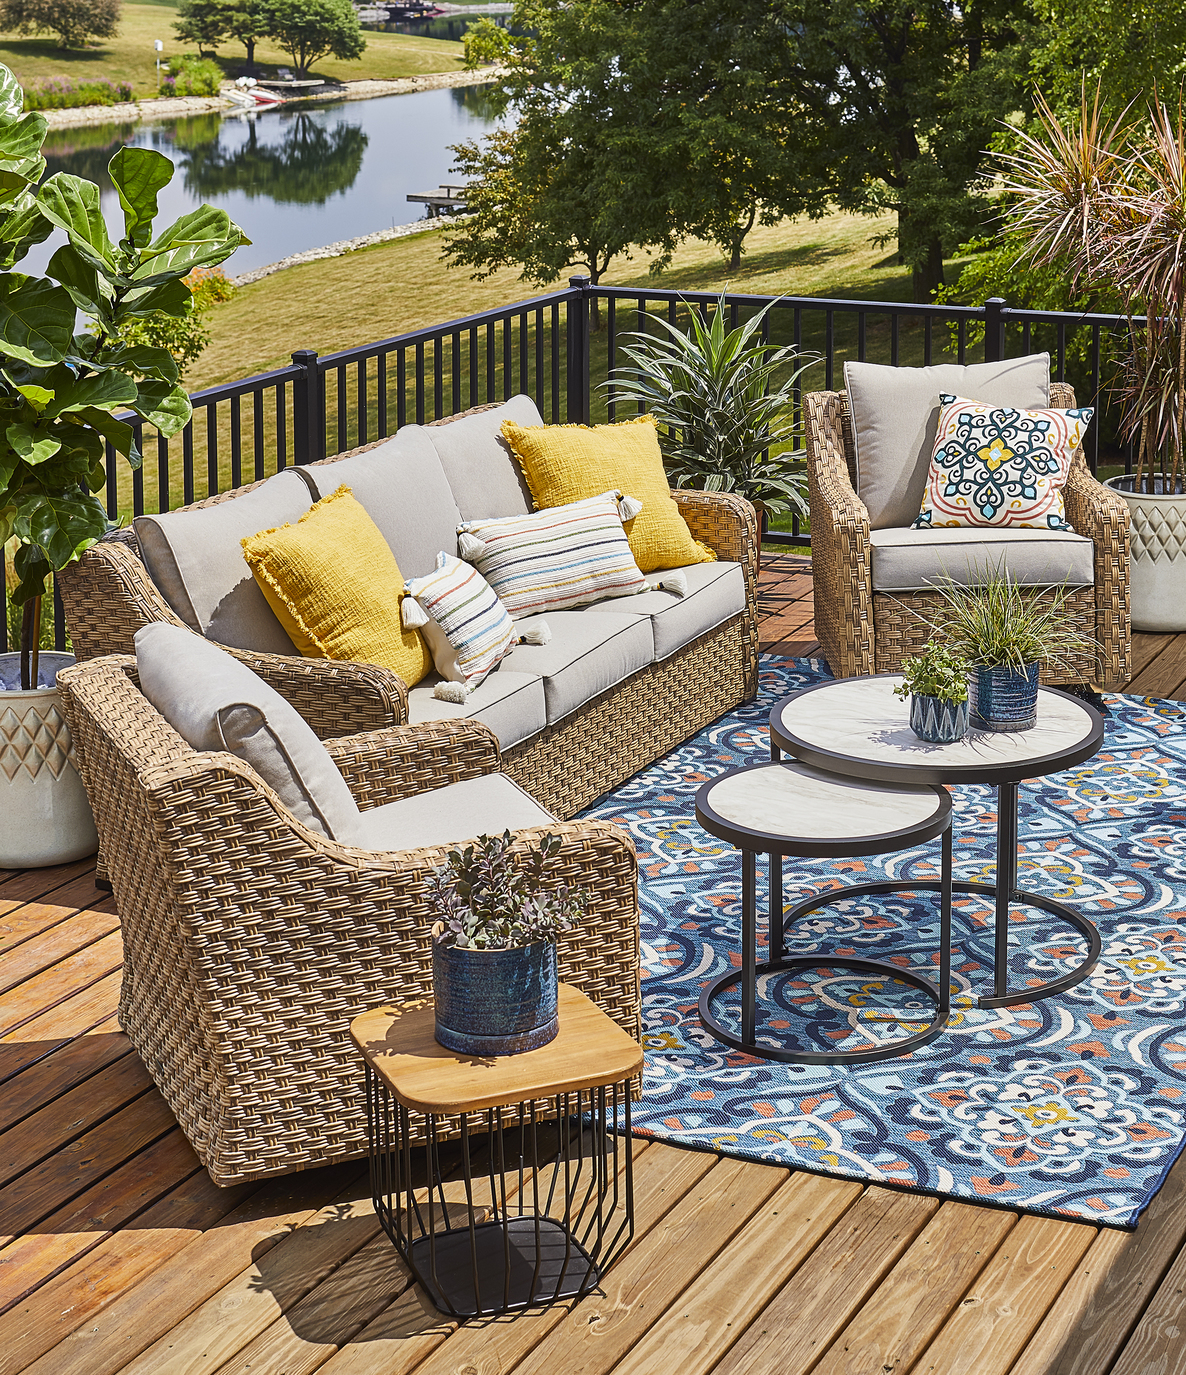 Better Homes & Gardens River Oaks 5-Piece Conversation Set with